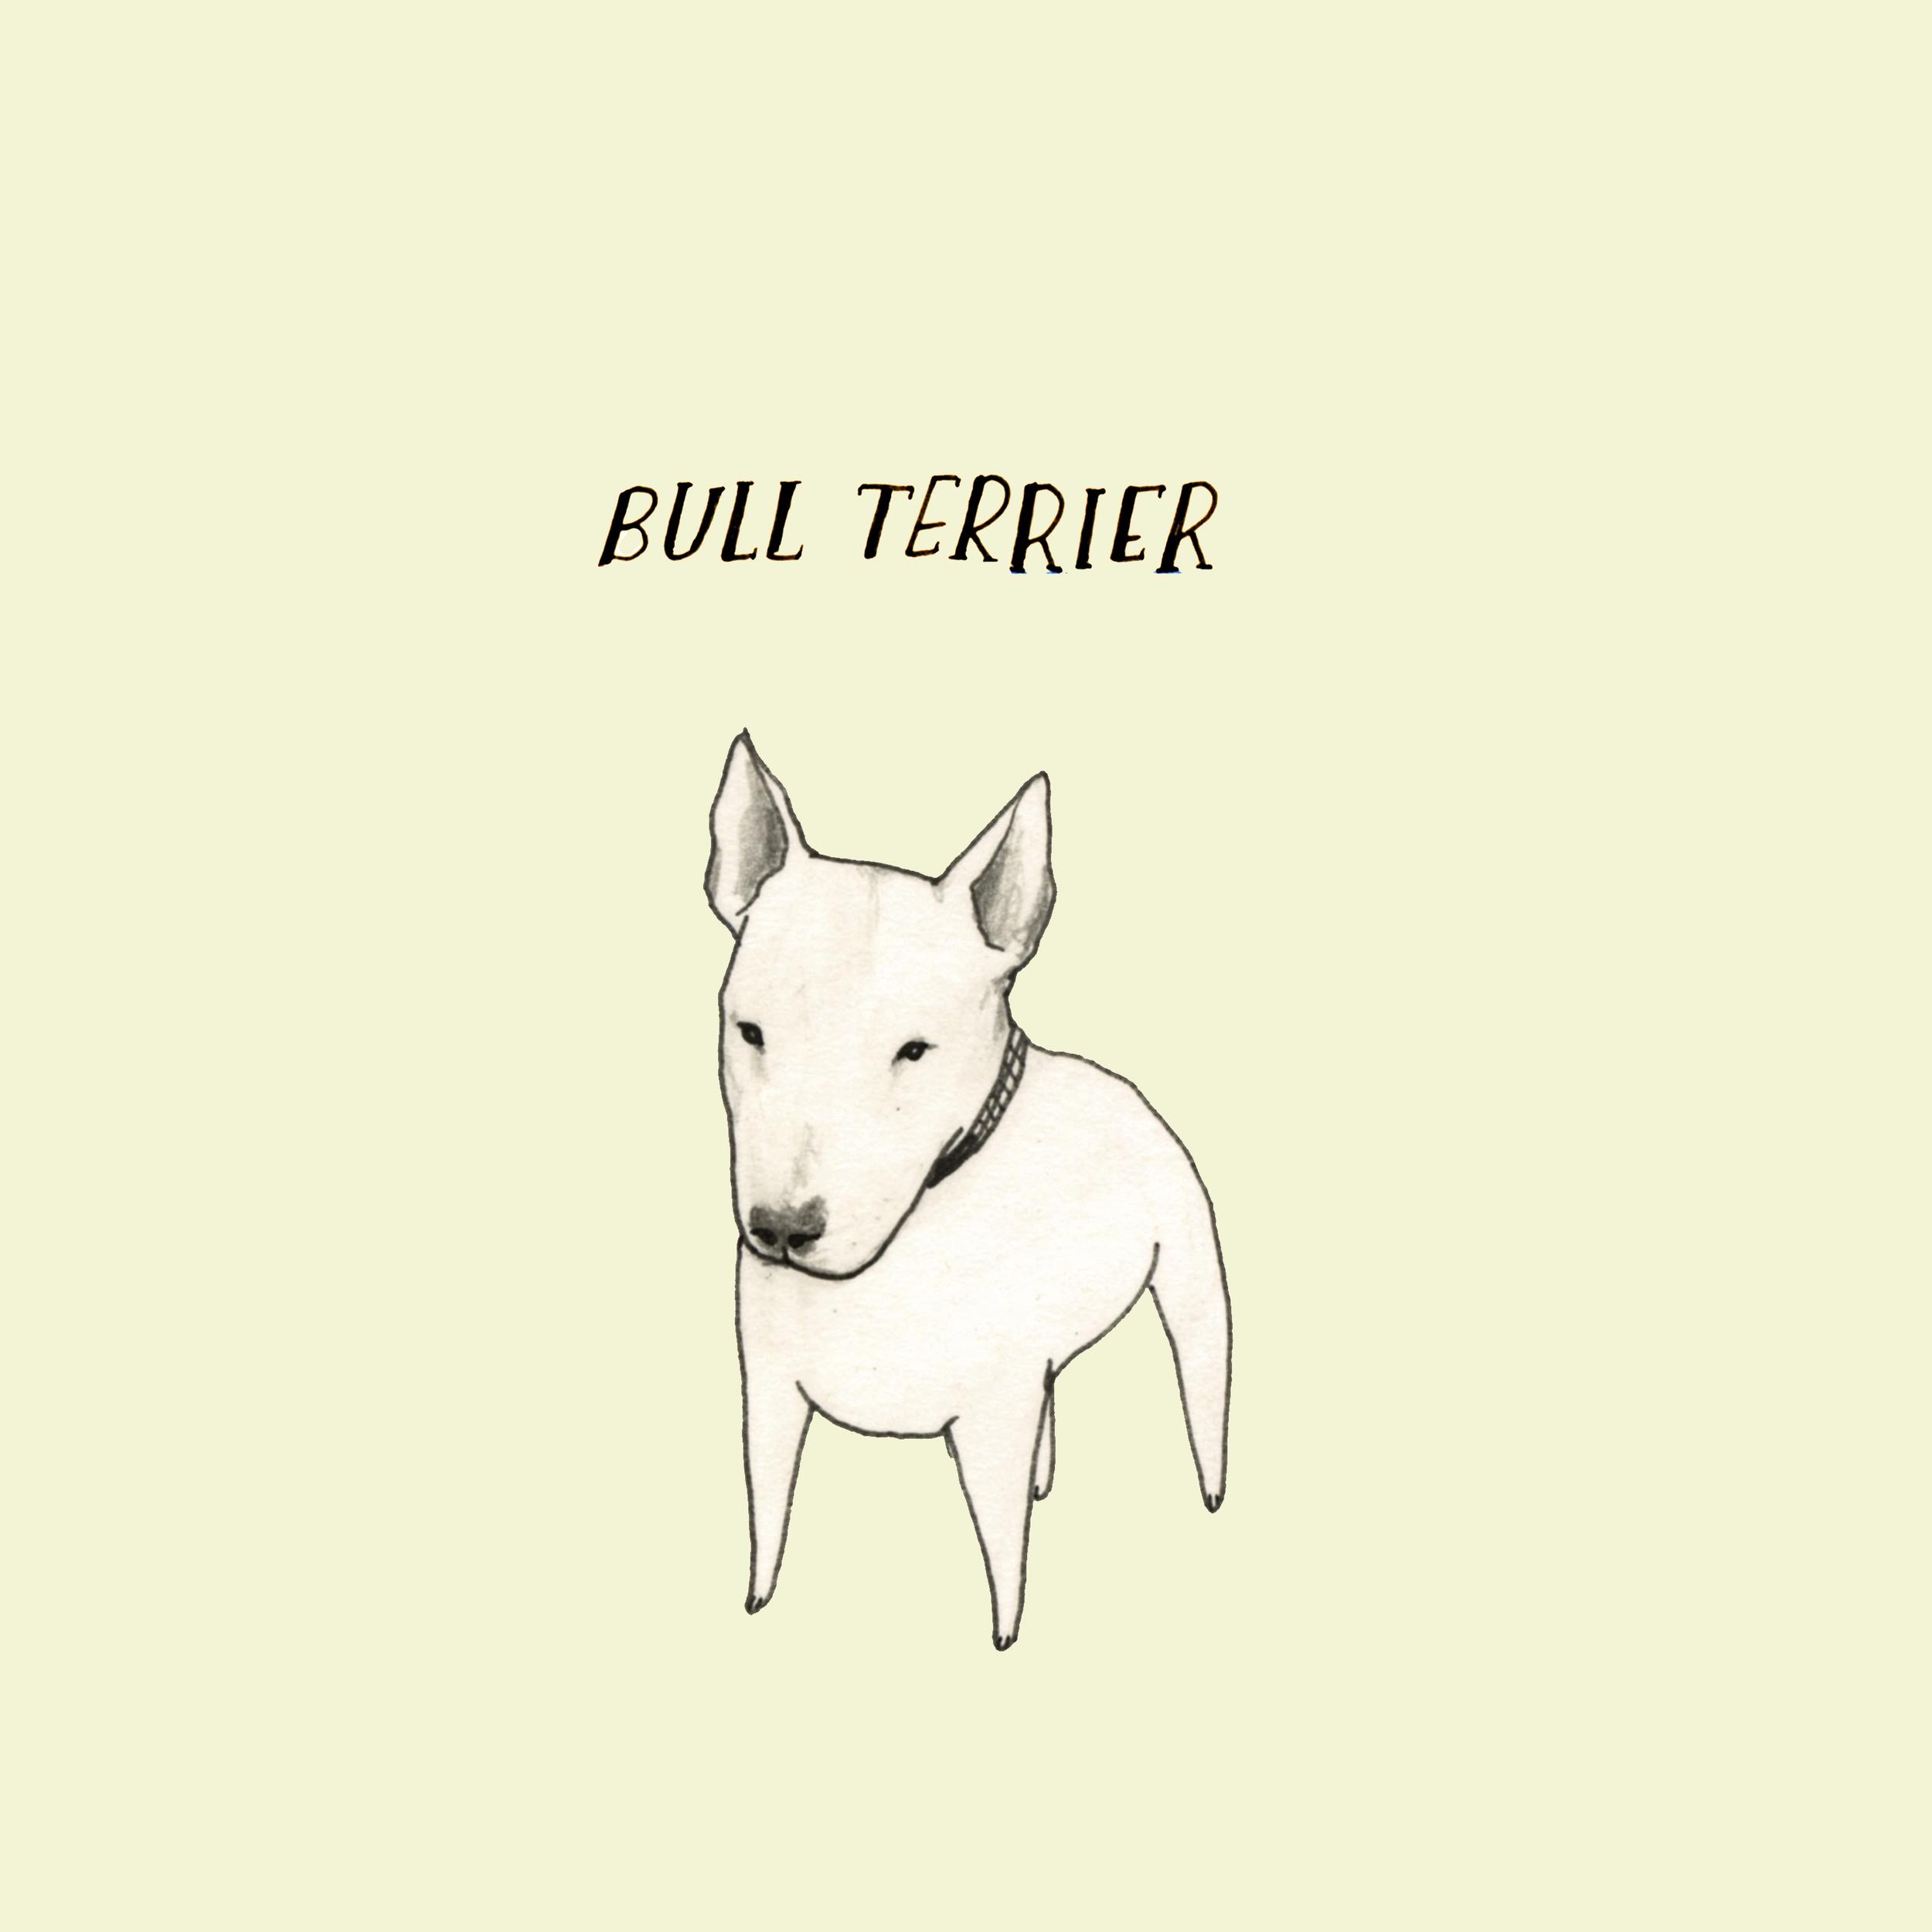 DogadayBullTerrier.jpg